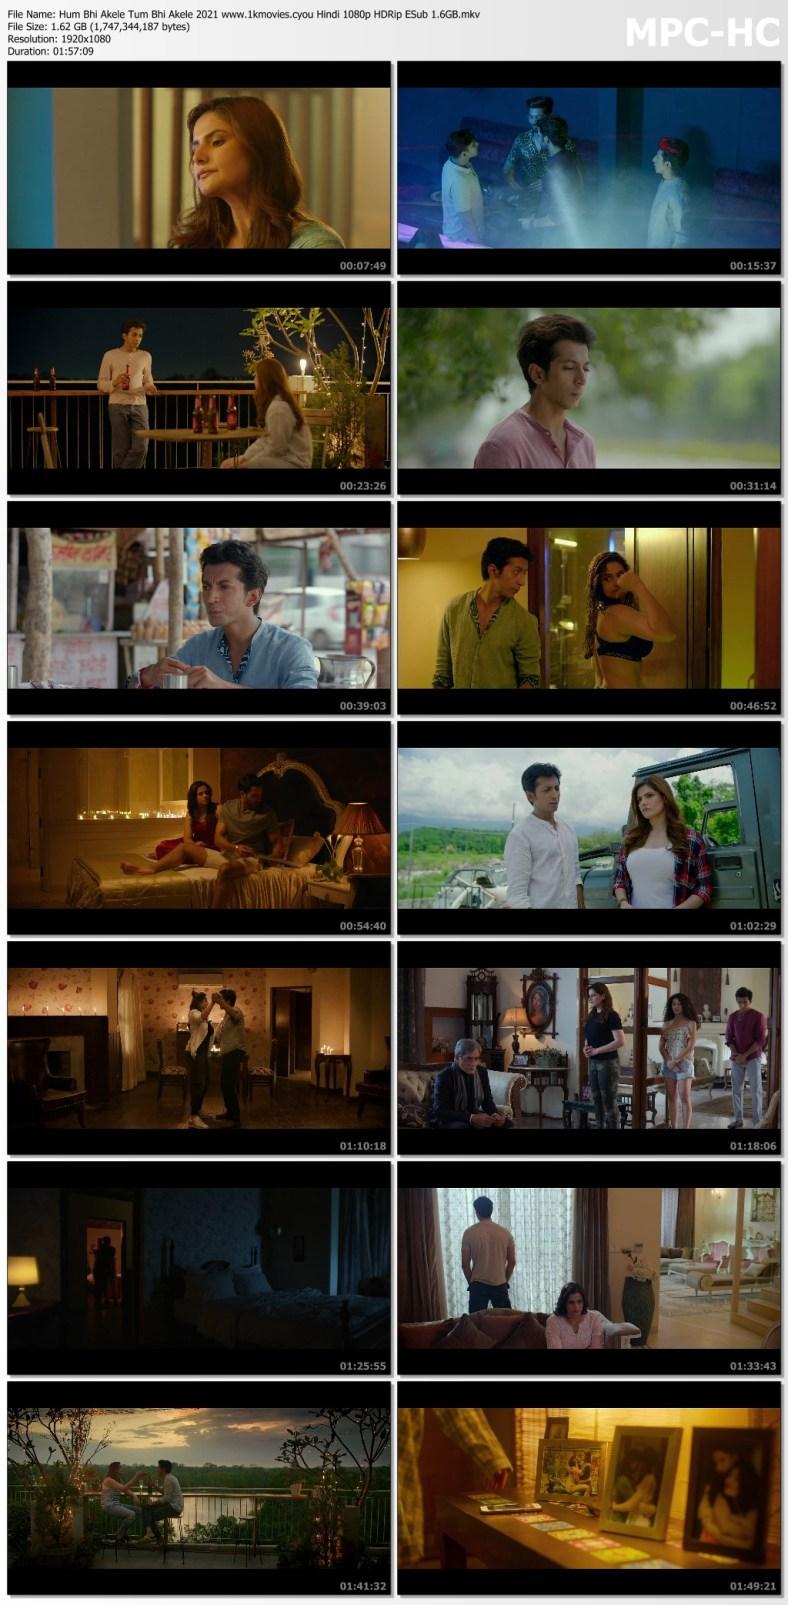 Download Hum Bhi Akele Tum Bhi Akele 2021 Hindi 480p HDRip ESub 400MB